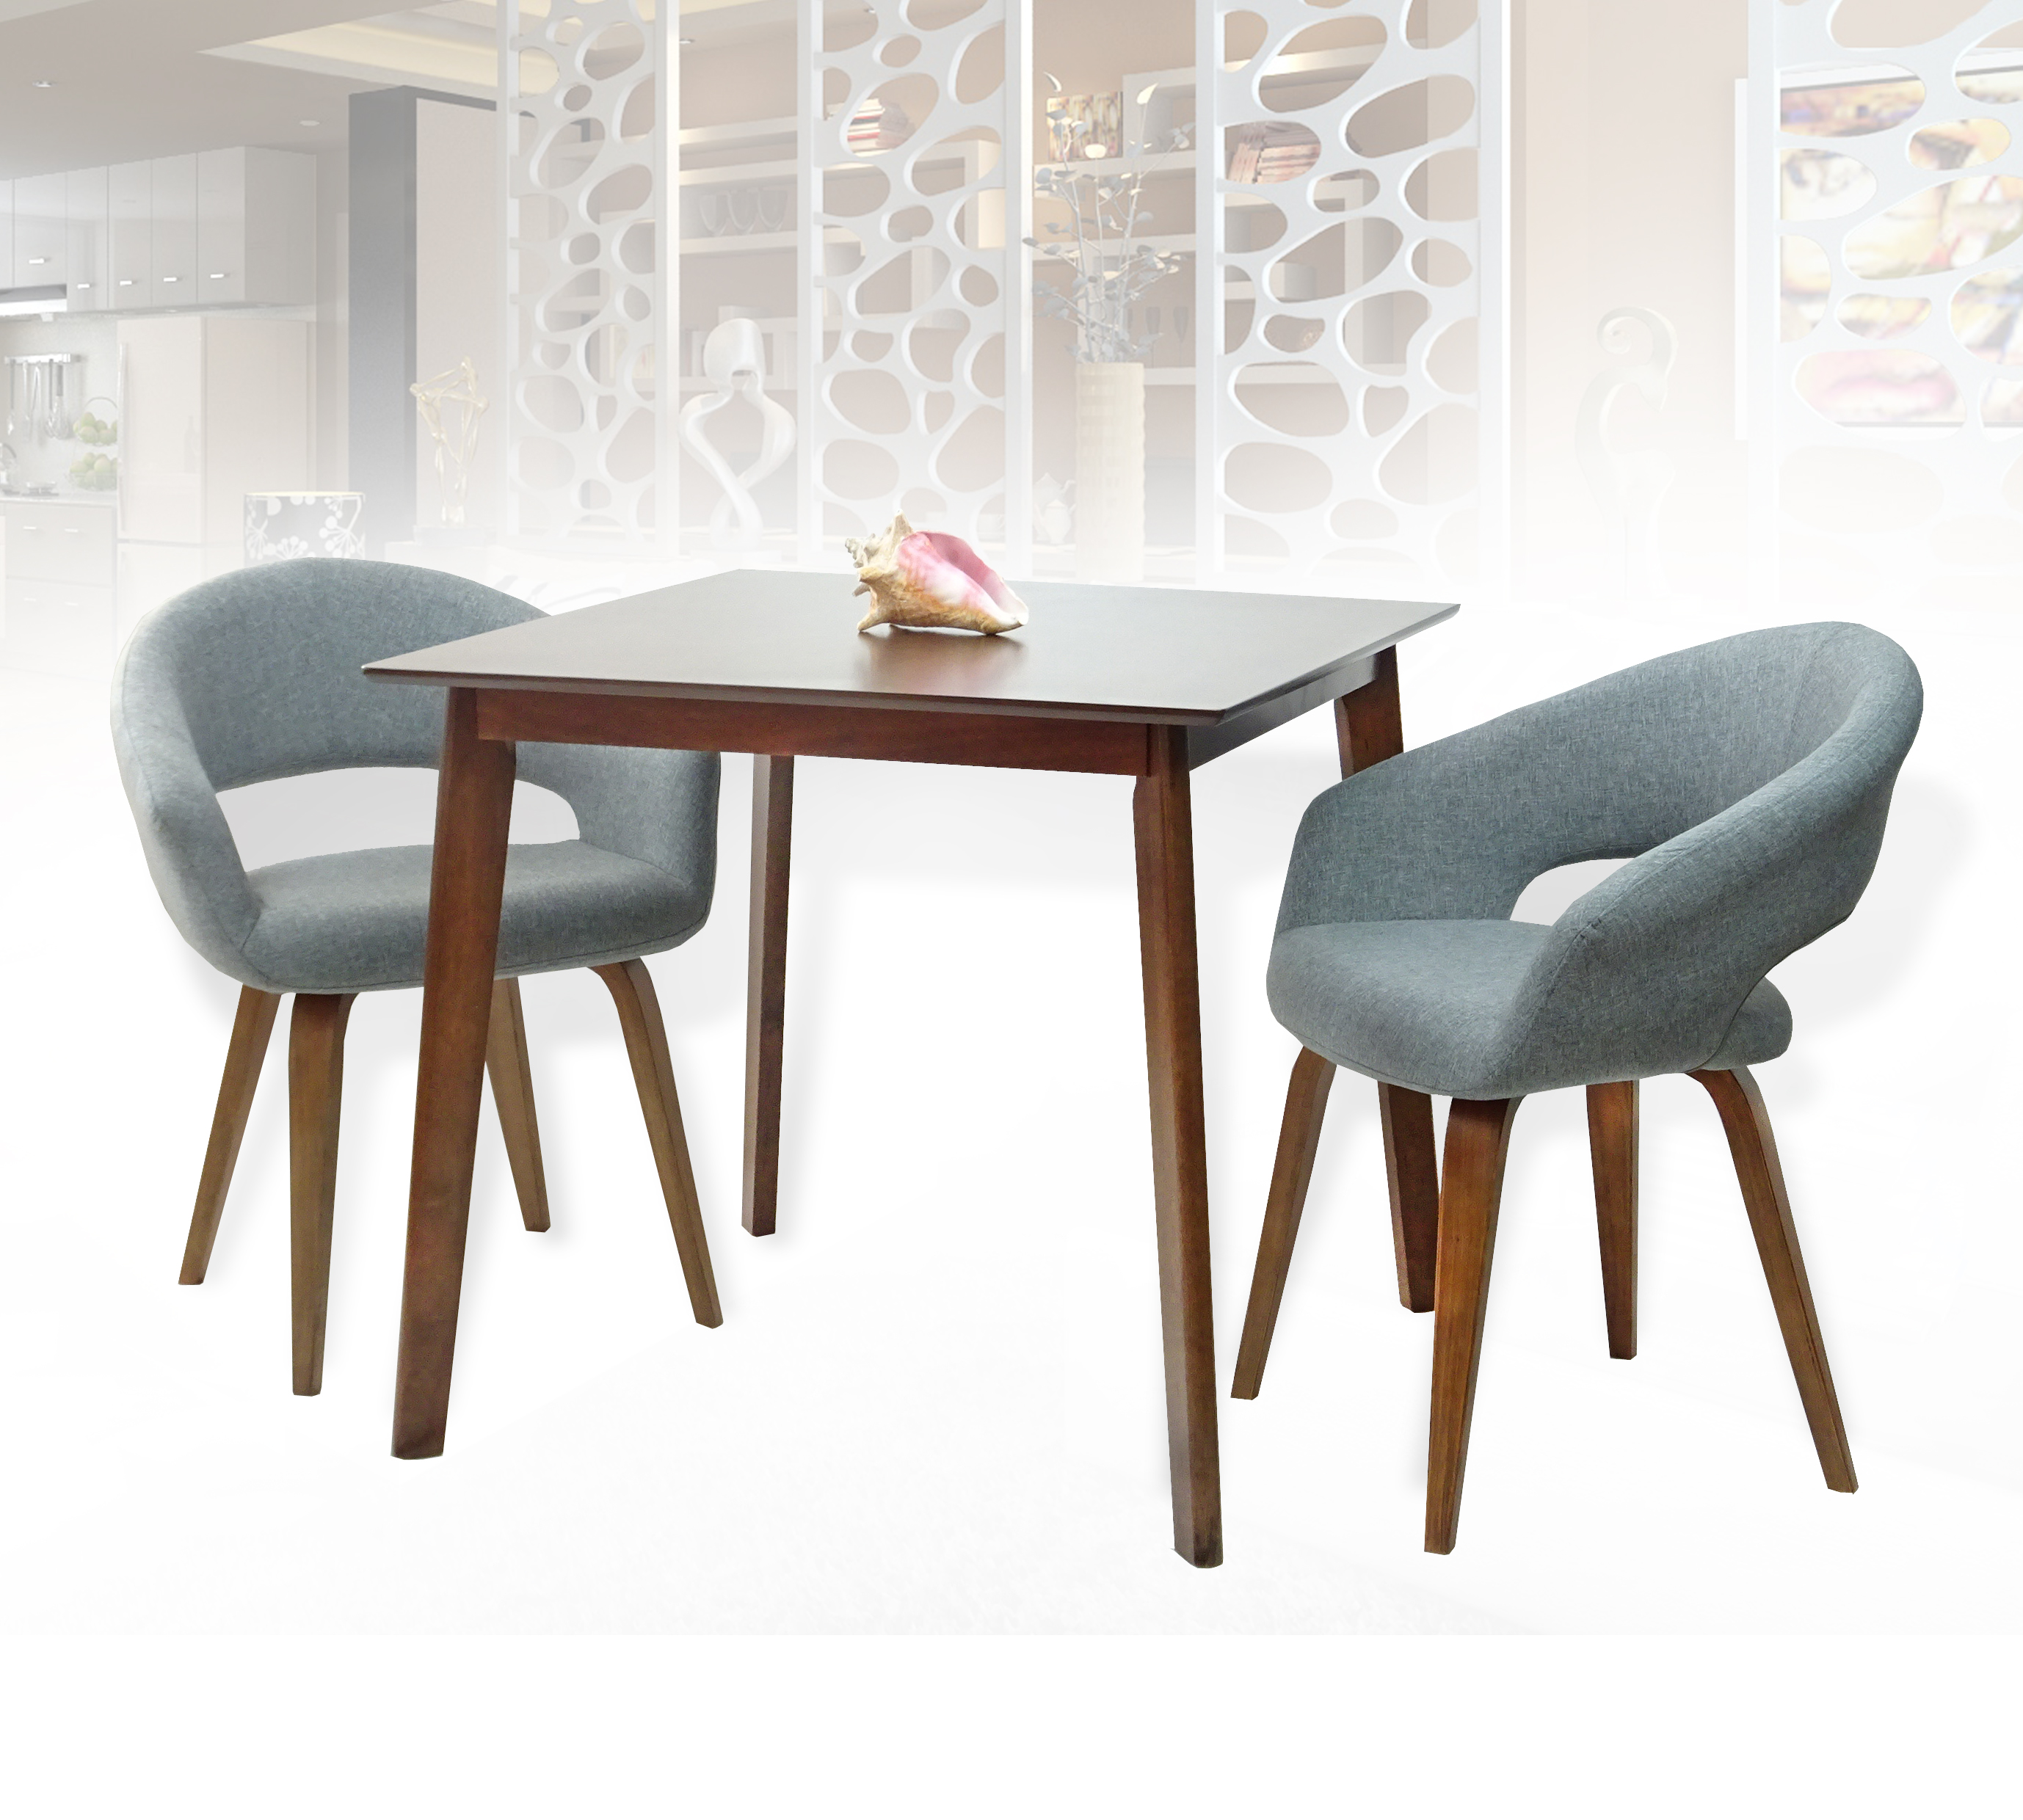 Buy Dining Kitchen Set Of 3 Square Wooden Medium Brown